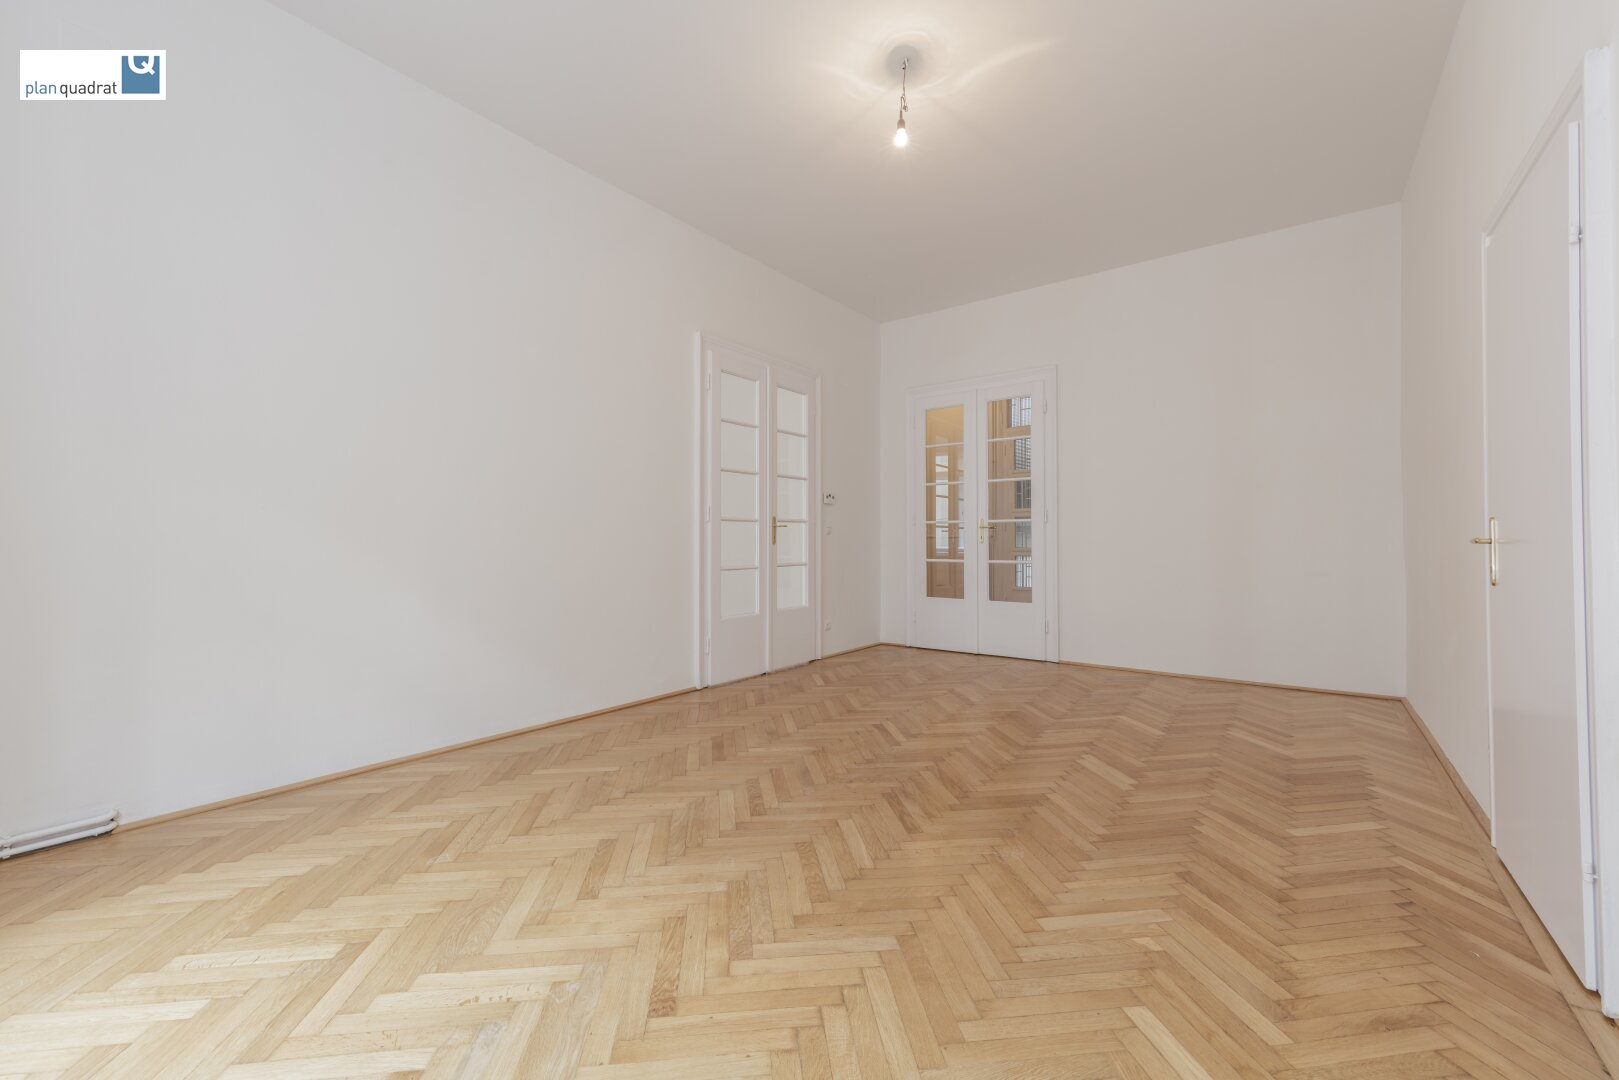 Büroraum 2 (gem. Grundriss - ca. 26,20 qm)